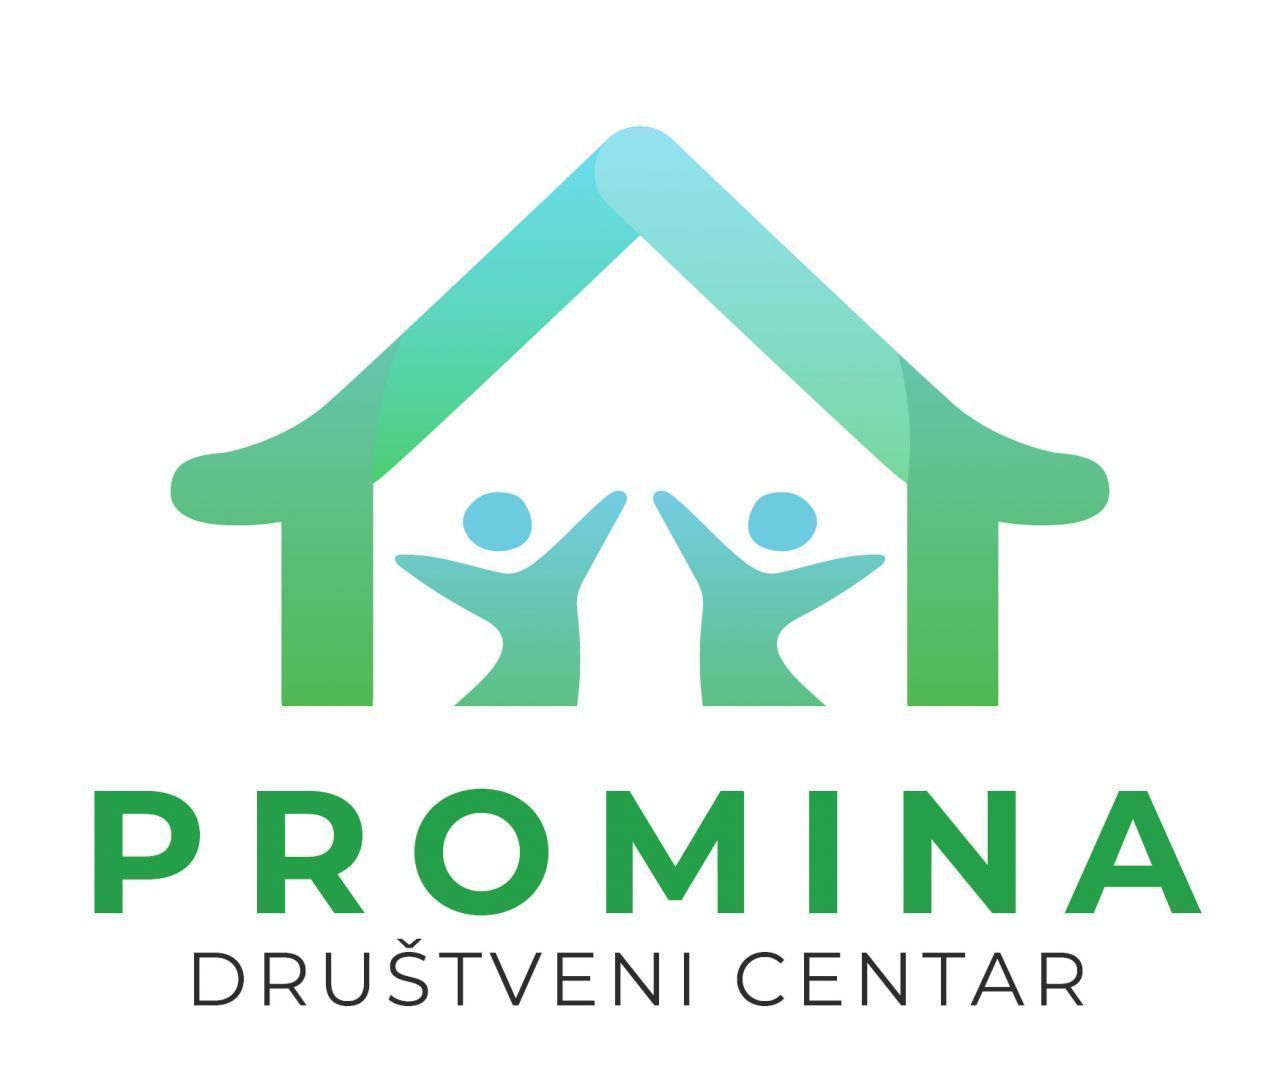 Društveni centar Promina - kalendar događanja za 08/2021.